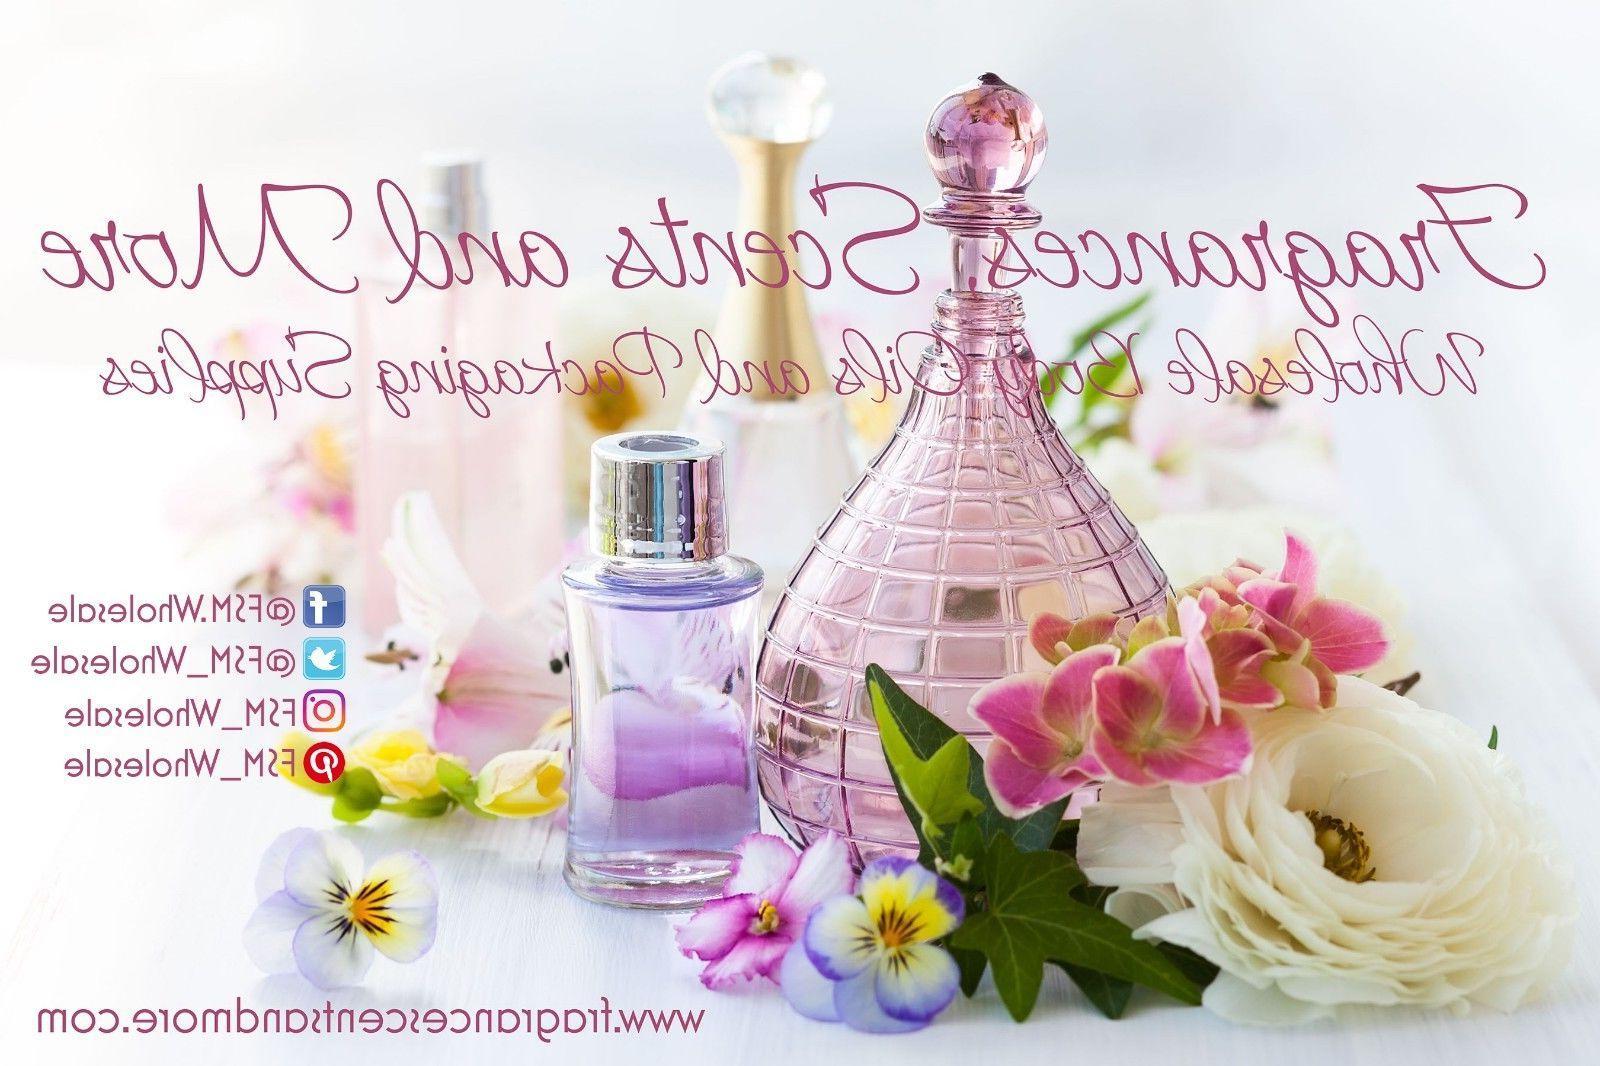 Lick Perfume/Body - Shipping